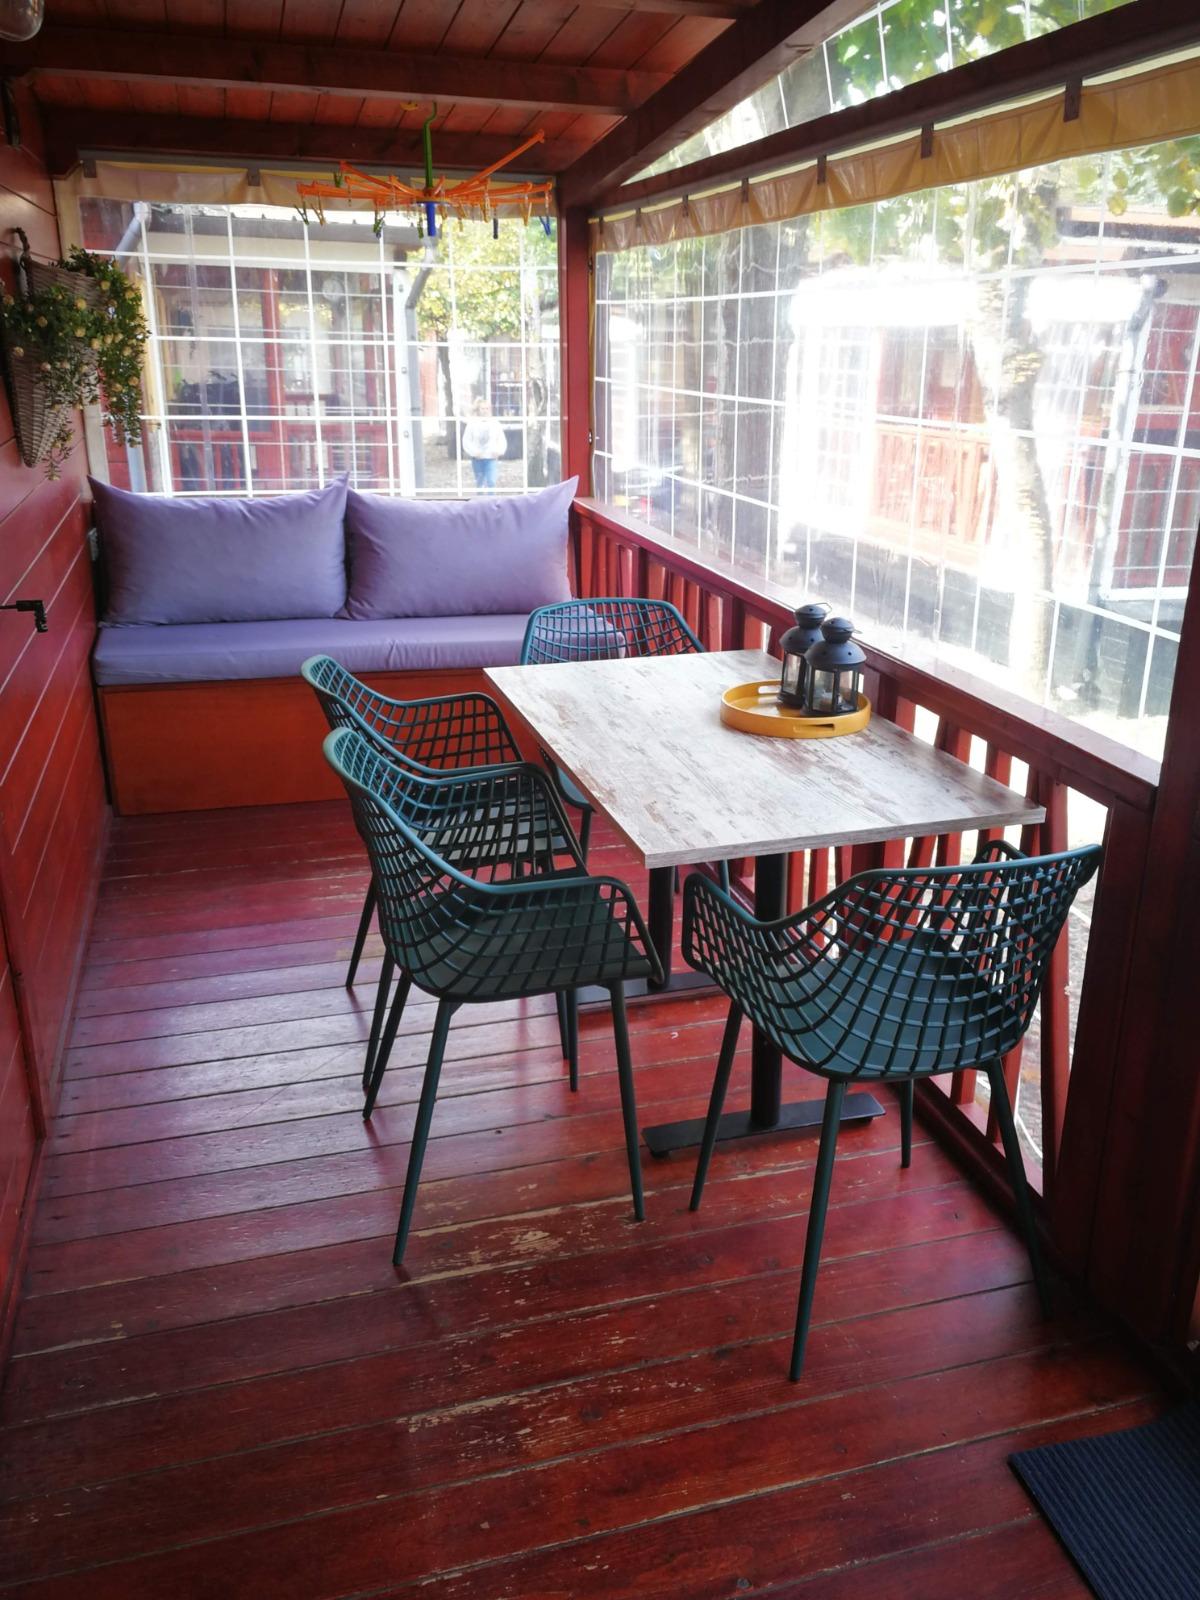 Torino 10 - veranda